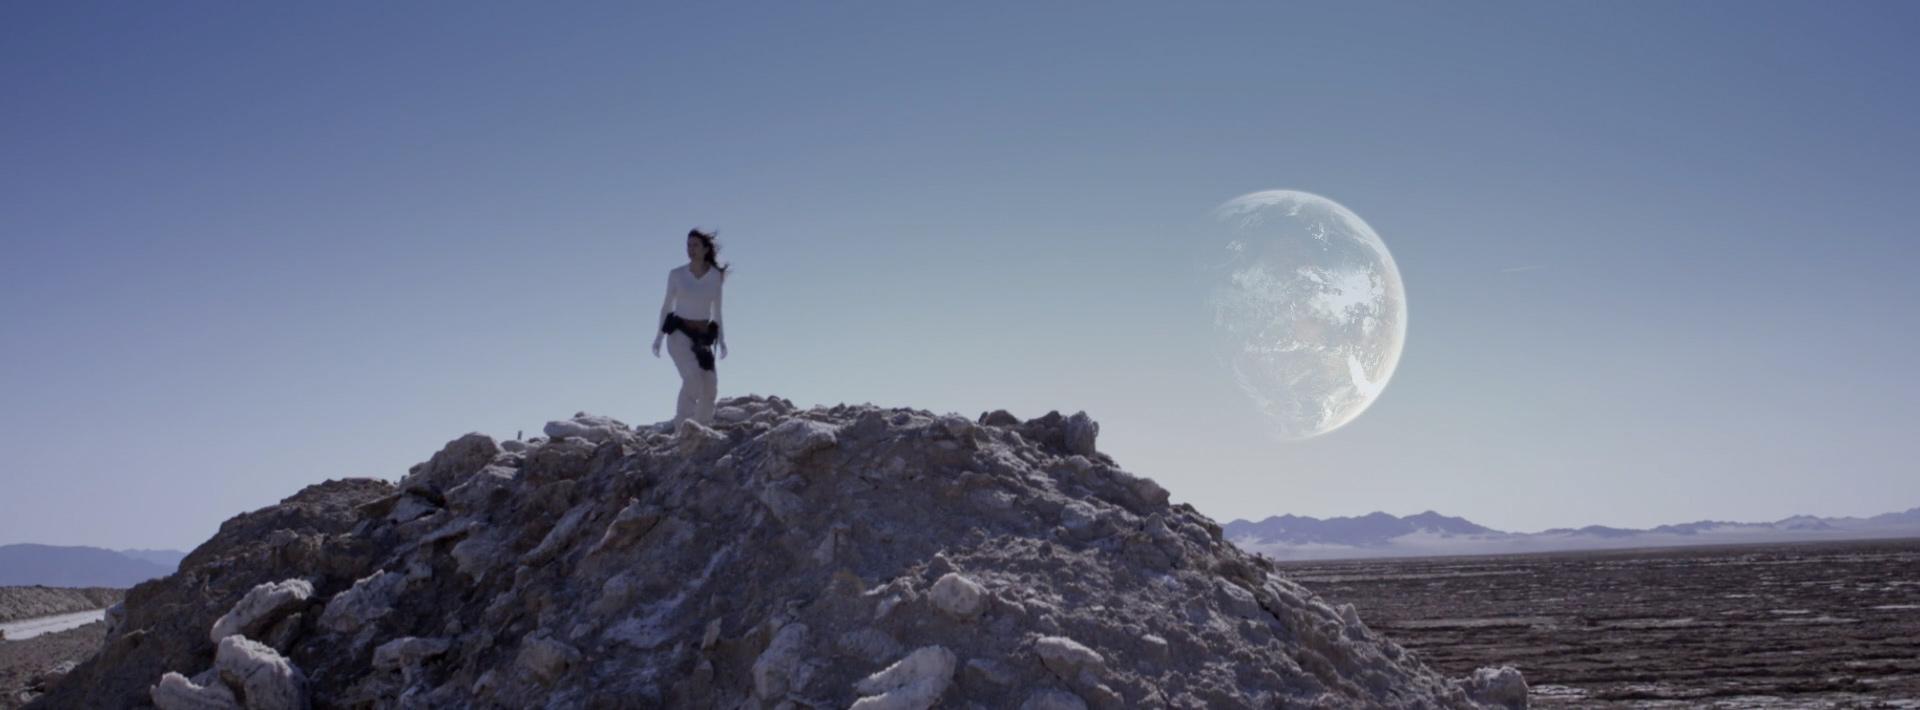 beautifully-shot-sci-fi-short-film-beyond-22.jpg